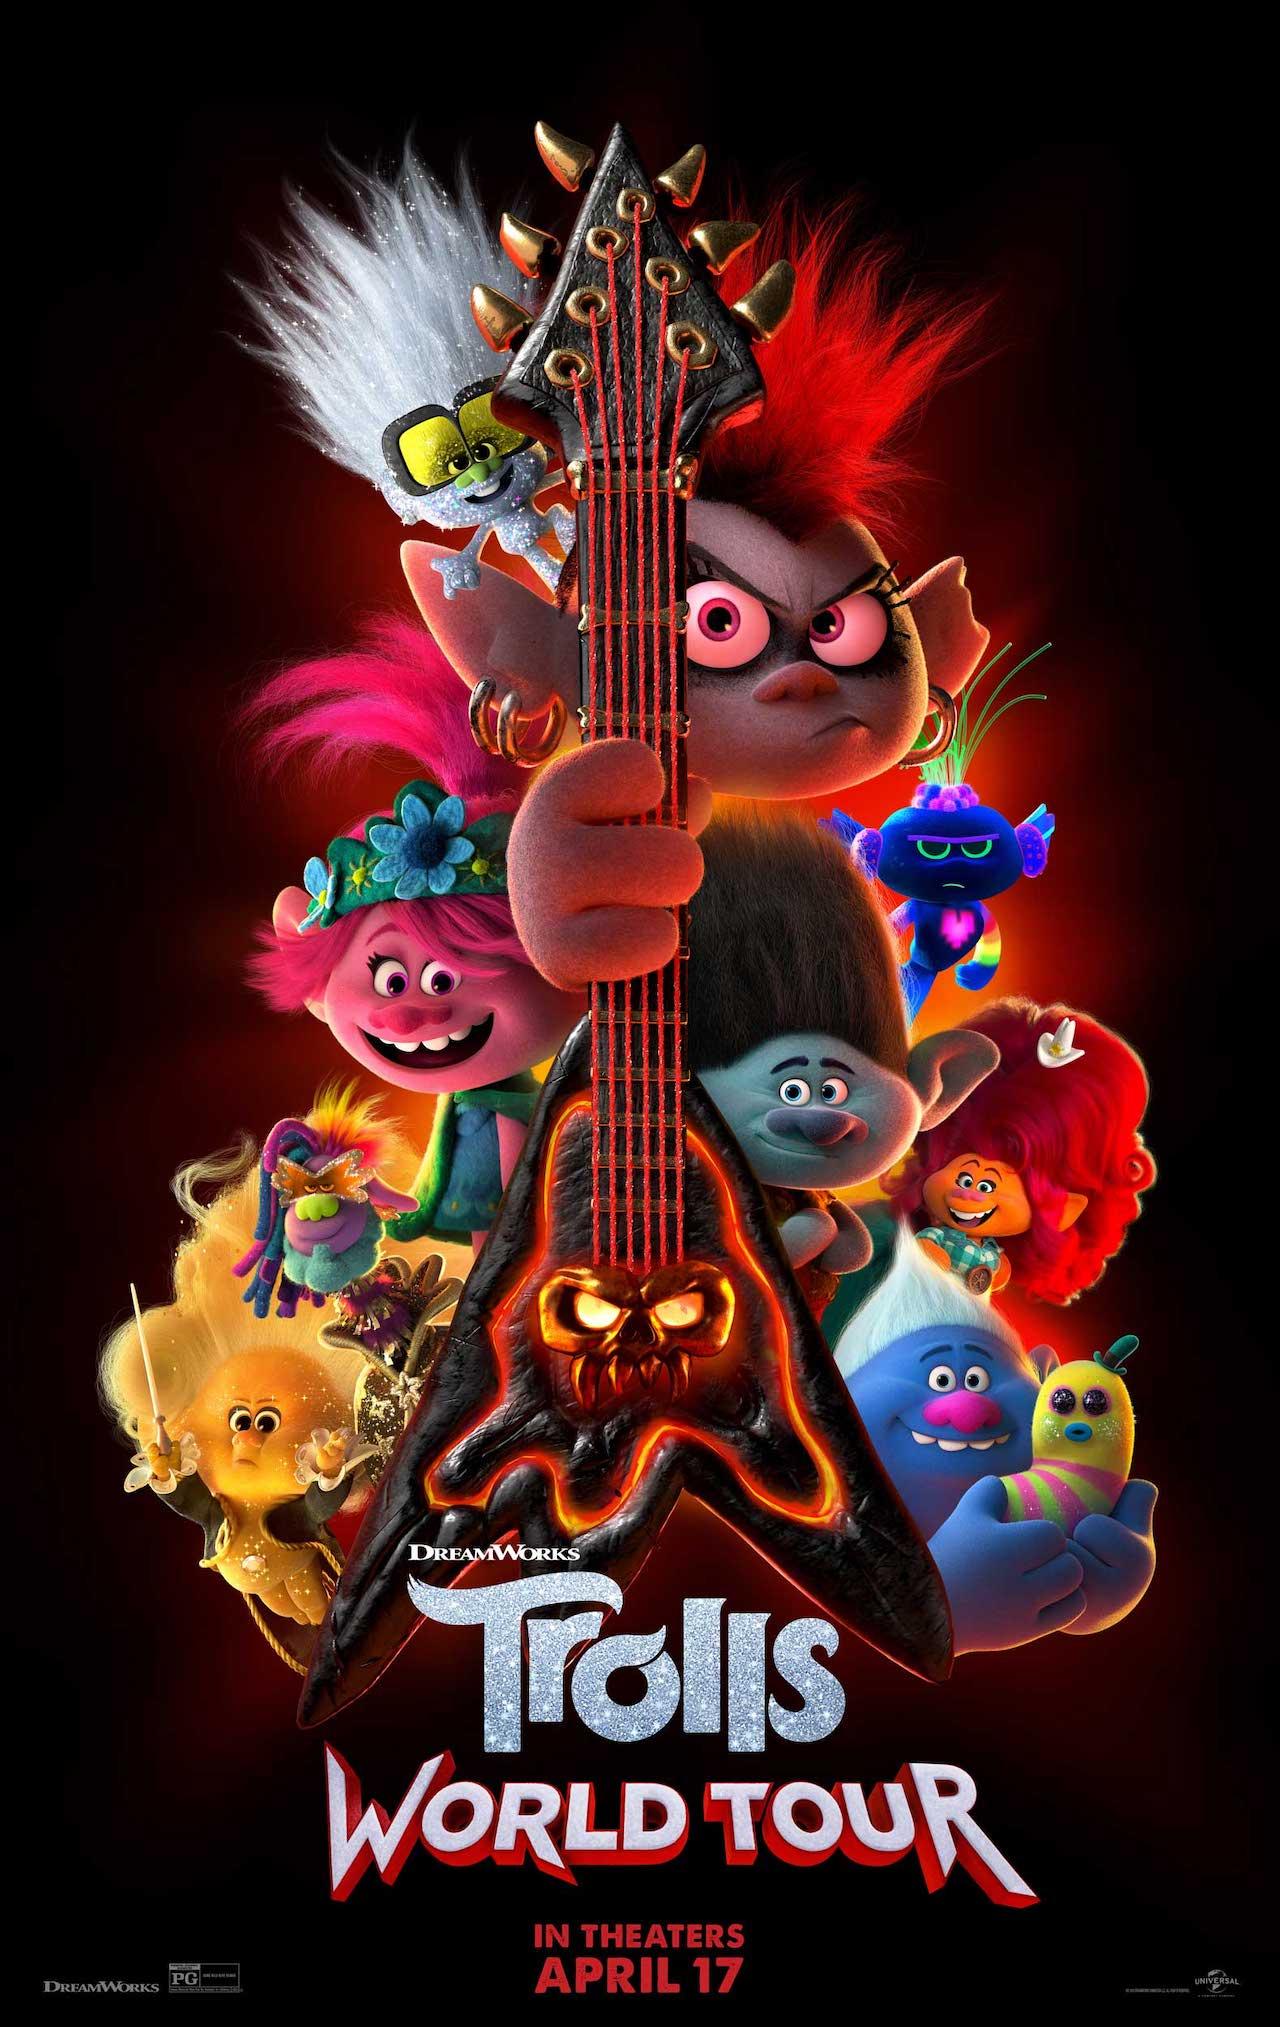 netflix difuzeaza un serial de animatie romanesc 3d (video) #stiridinlumeanimatiei Netflix difuzeaza un serial de animatie 3D romanesc (VIDEO) #stiridinlumeanimatiei trolls world tour poster